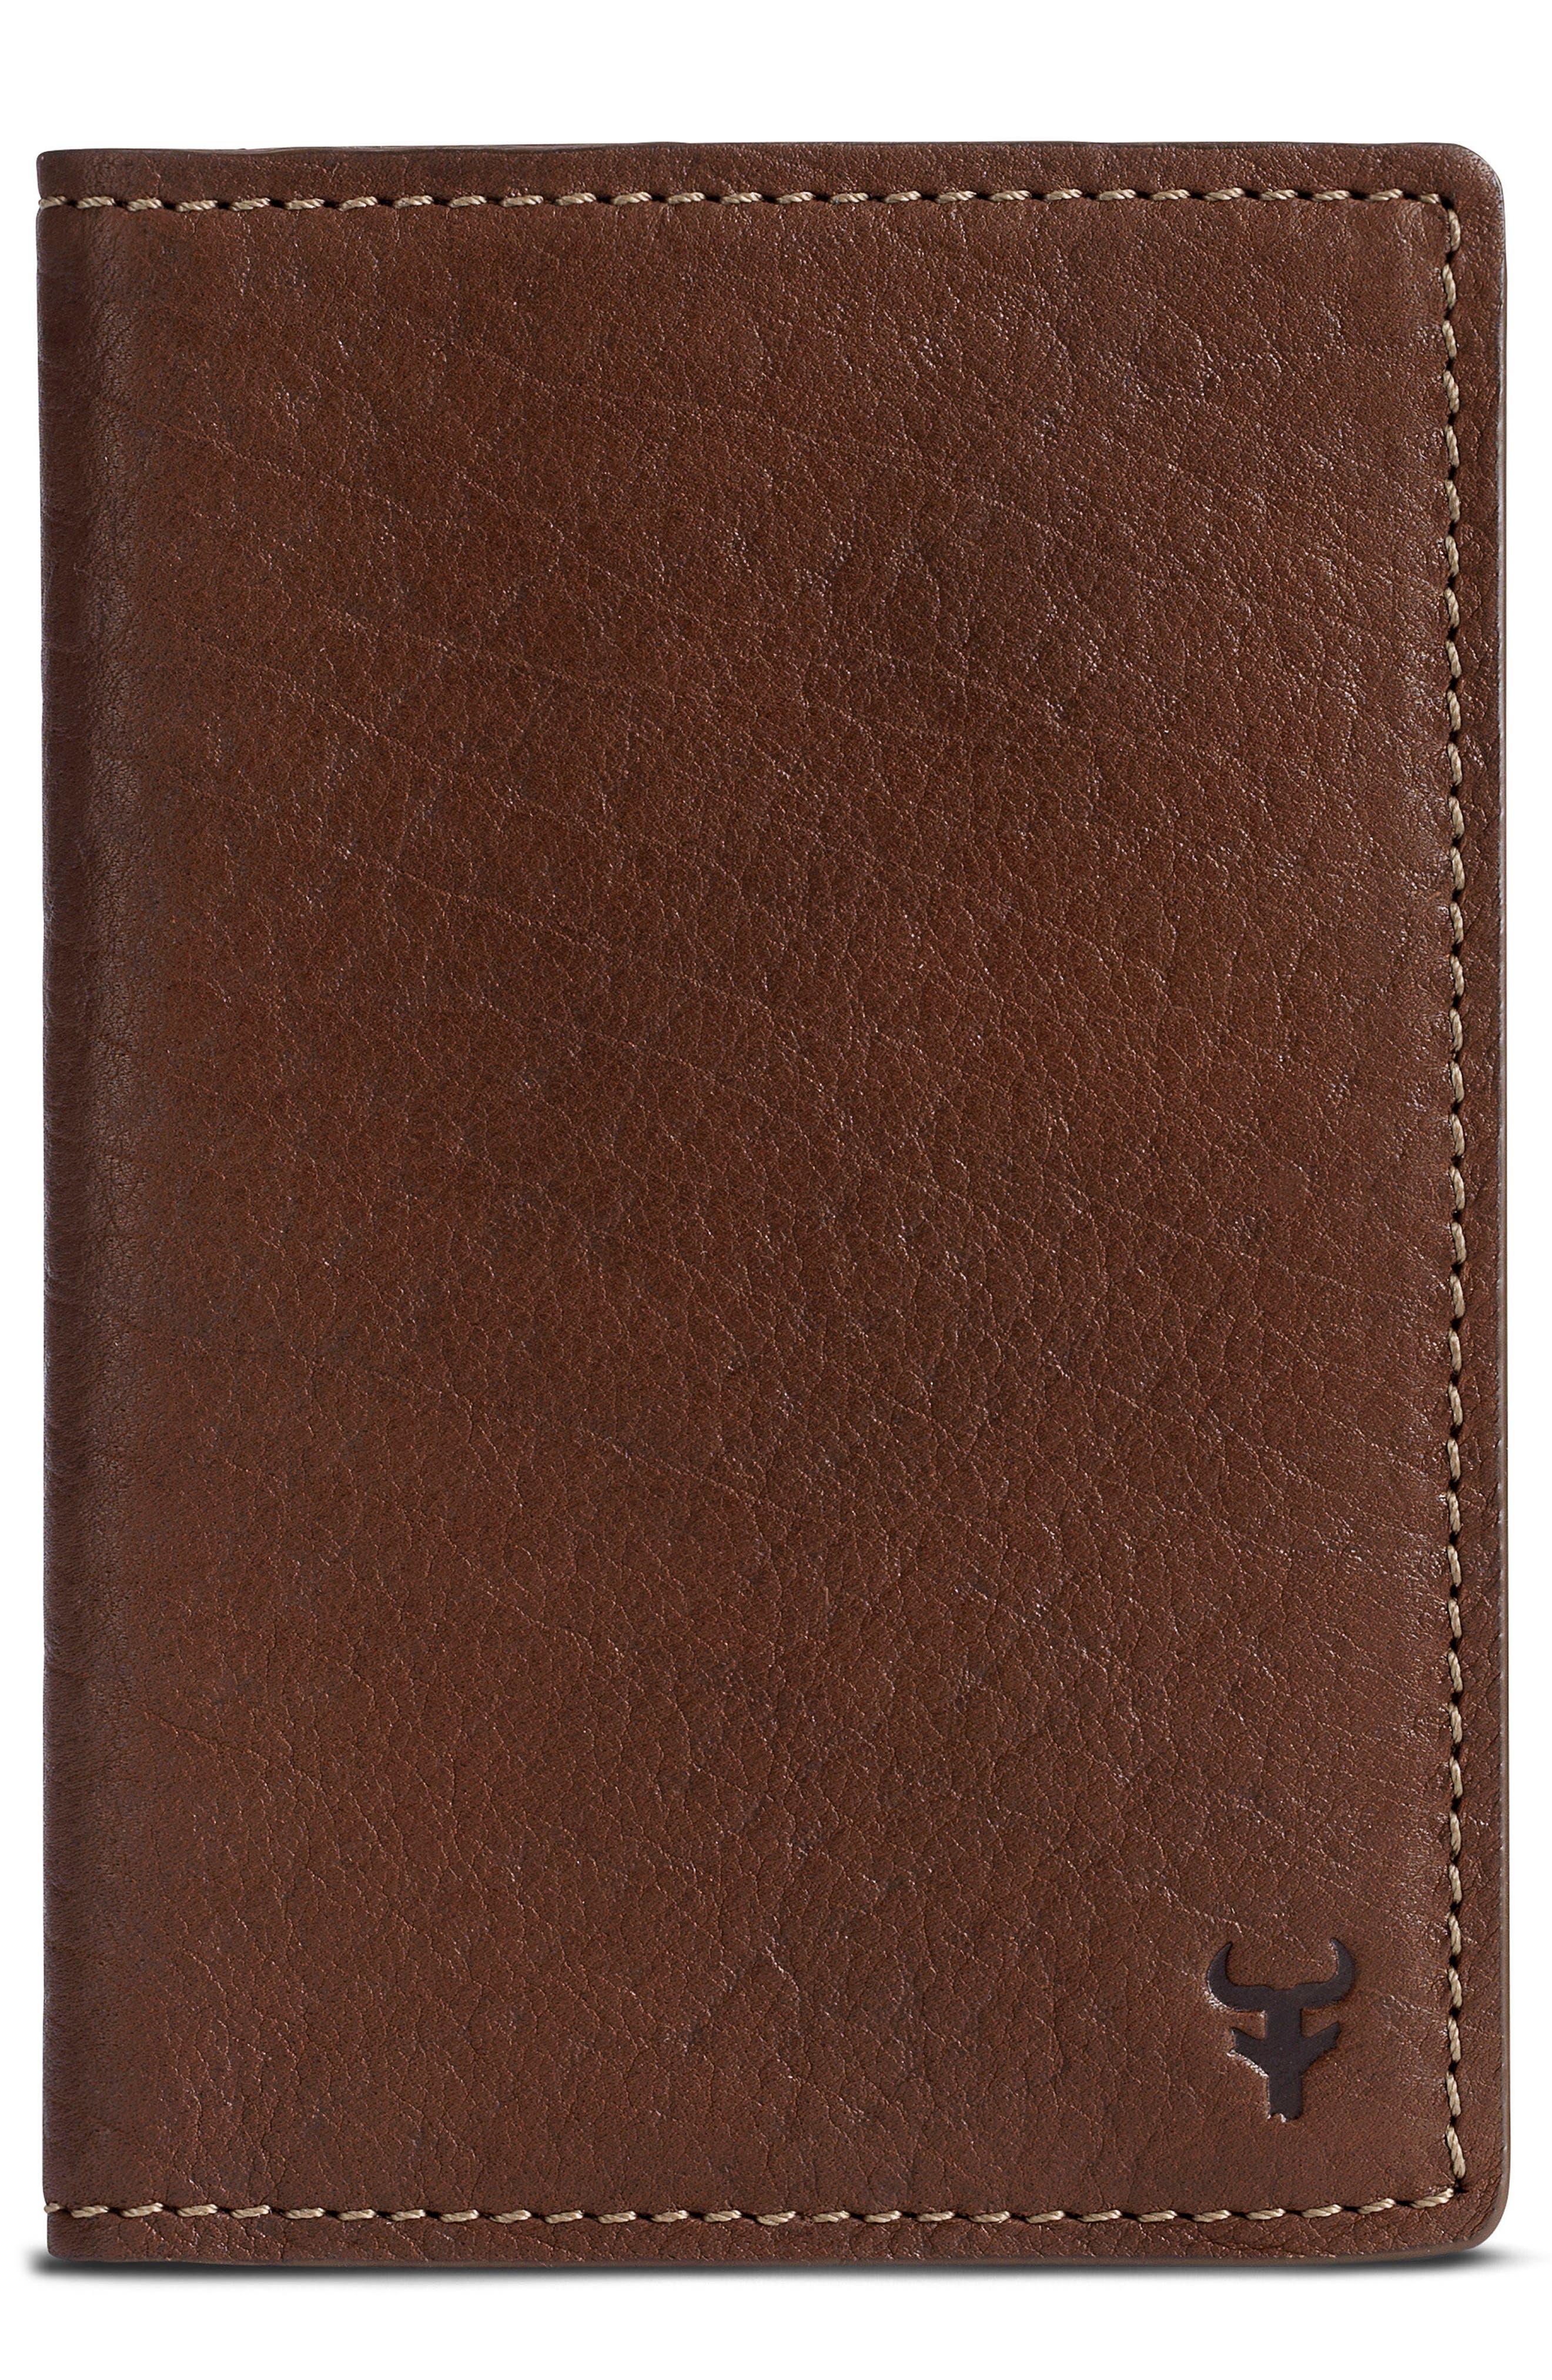 Alternate Image 1 Selected - Trask Jackson Passport Cover